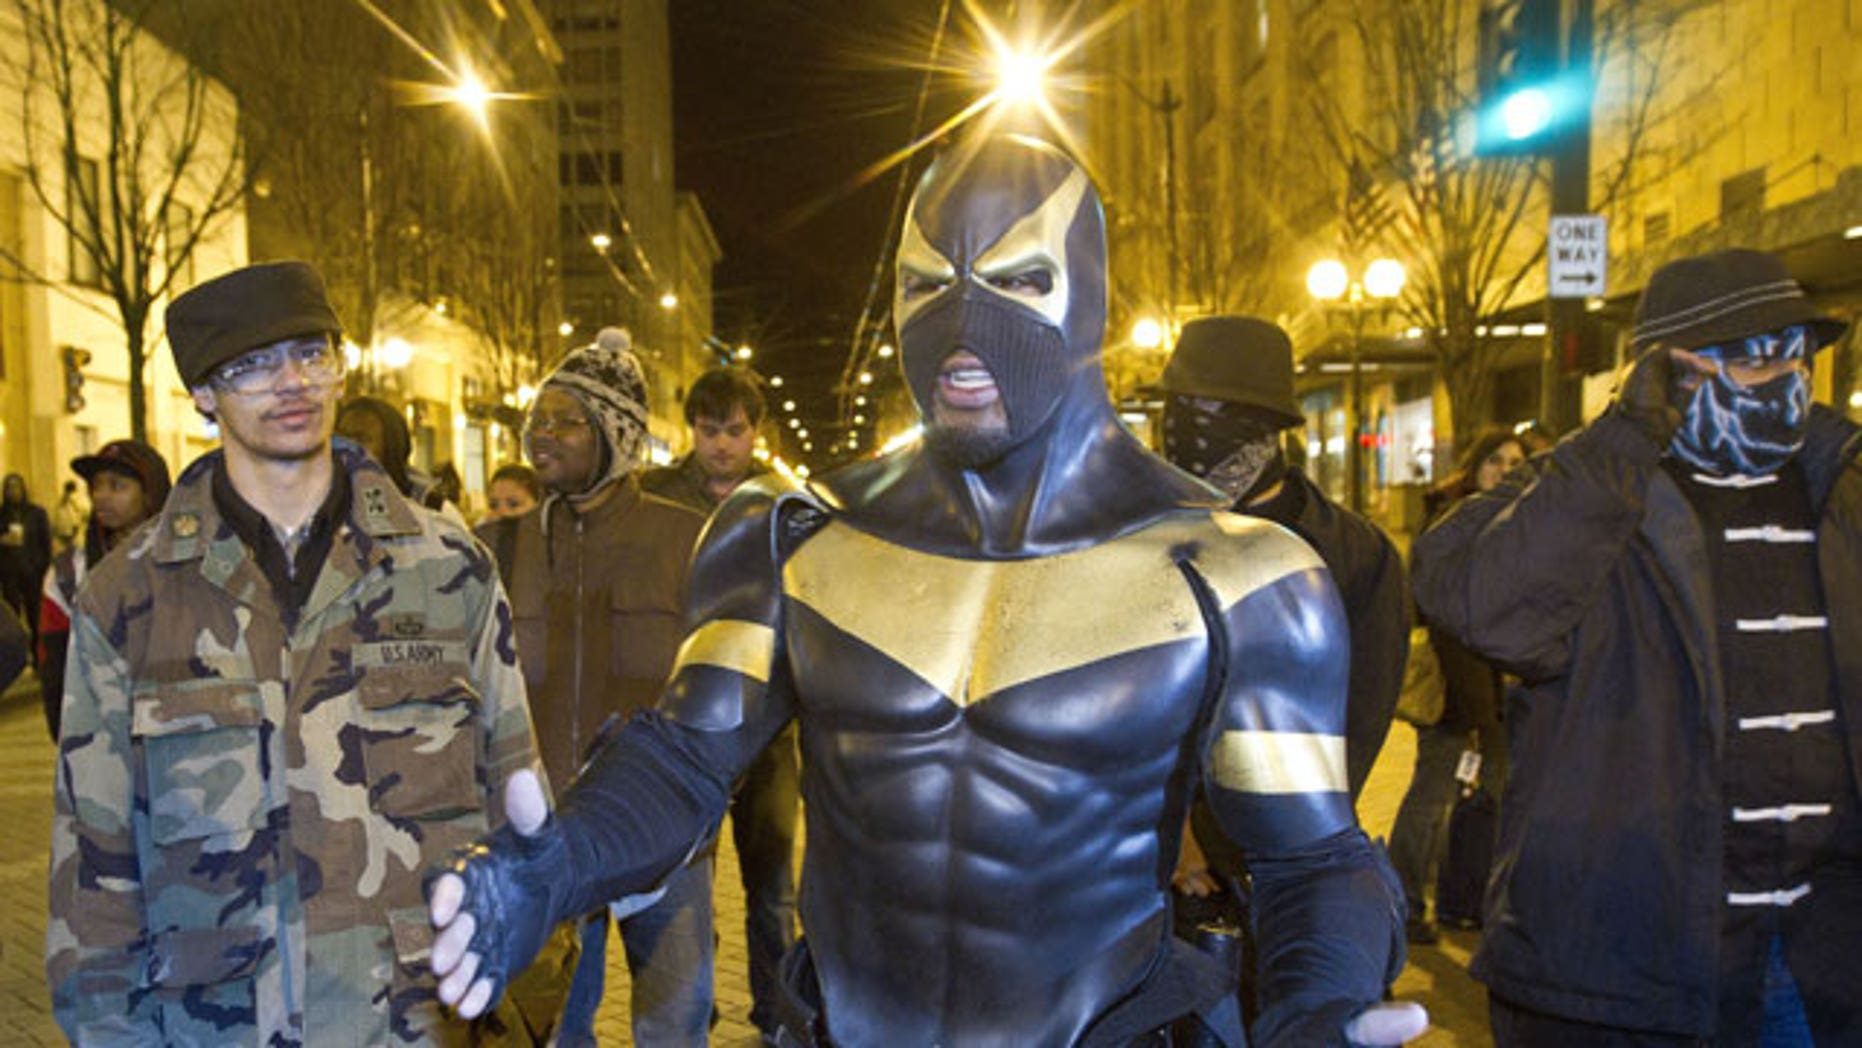 In this photo taken Feb. 26, 2011, Self-described superhero Phoenix Jones meets protestors at Westlake Park in Seattle.